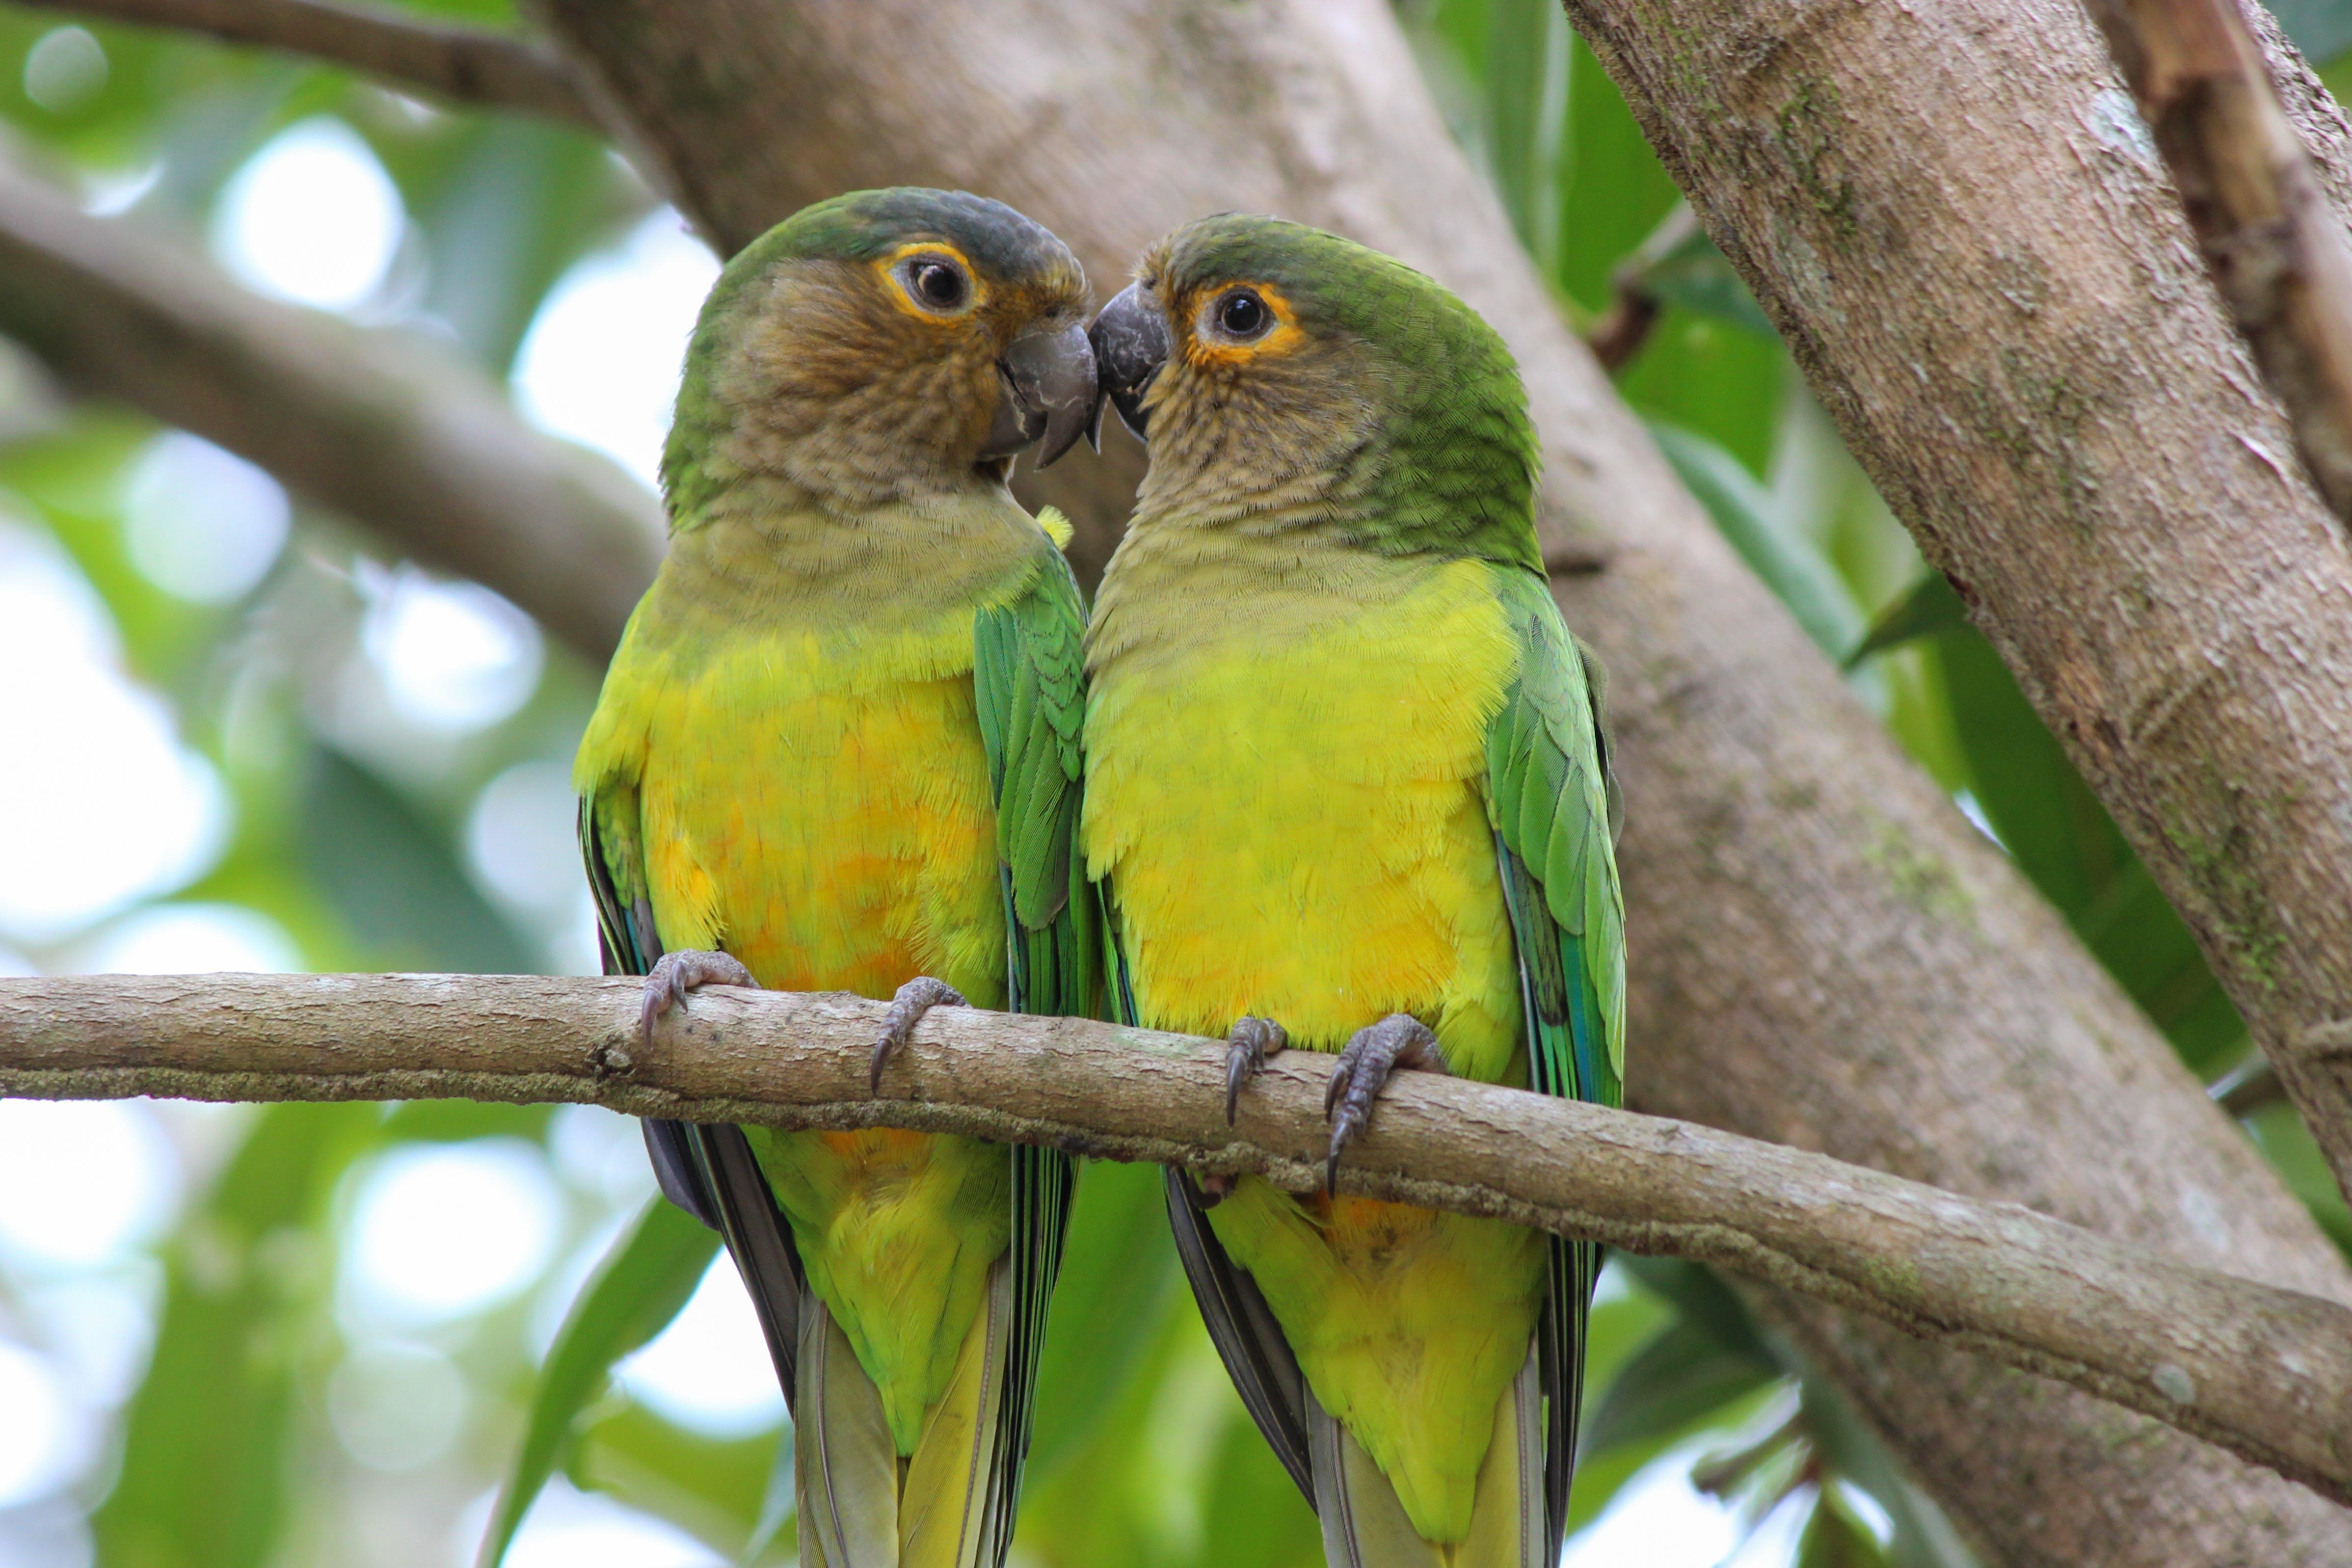 Free stock photo of brown-throated parakeet, cara sucia, carisucio, Eupsittula pertinax